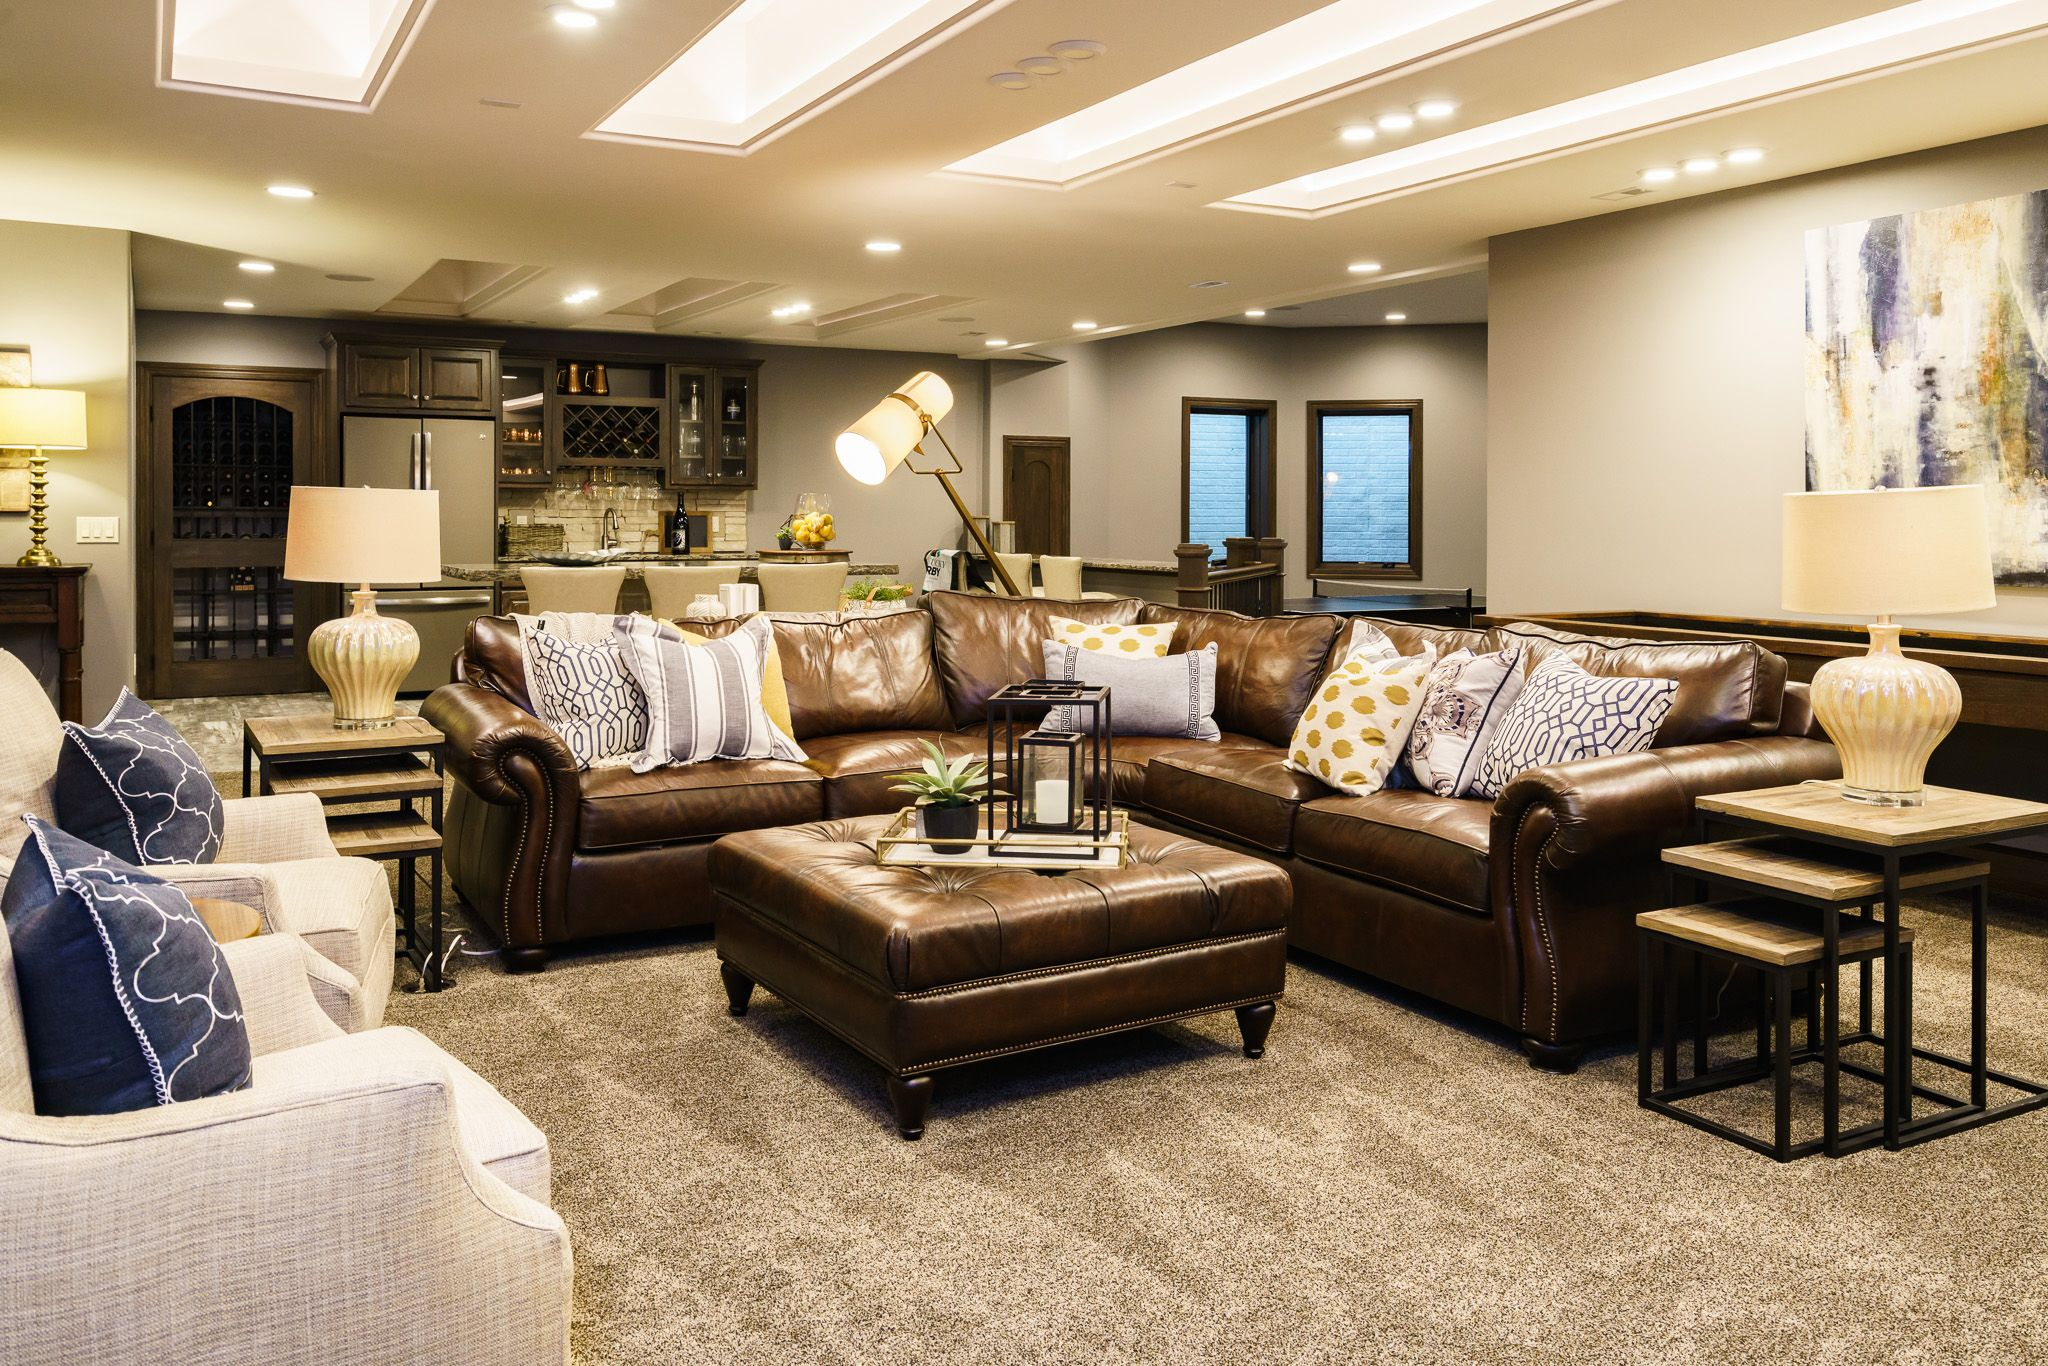 omaha interior design | Psoriasisguru.com